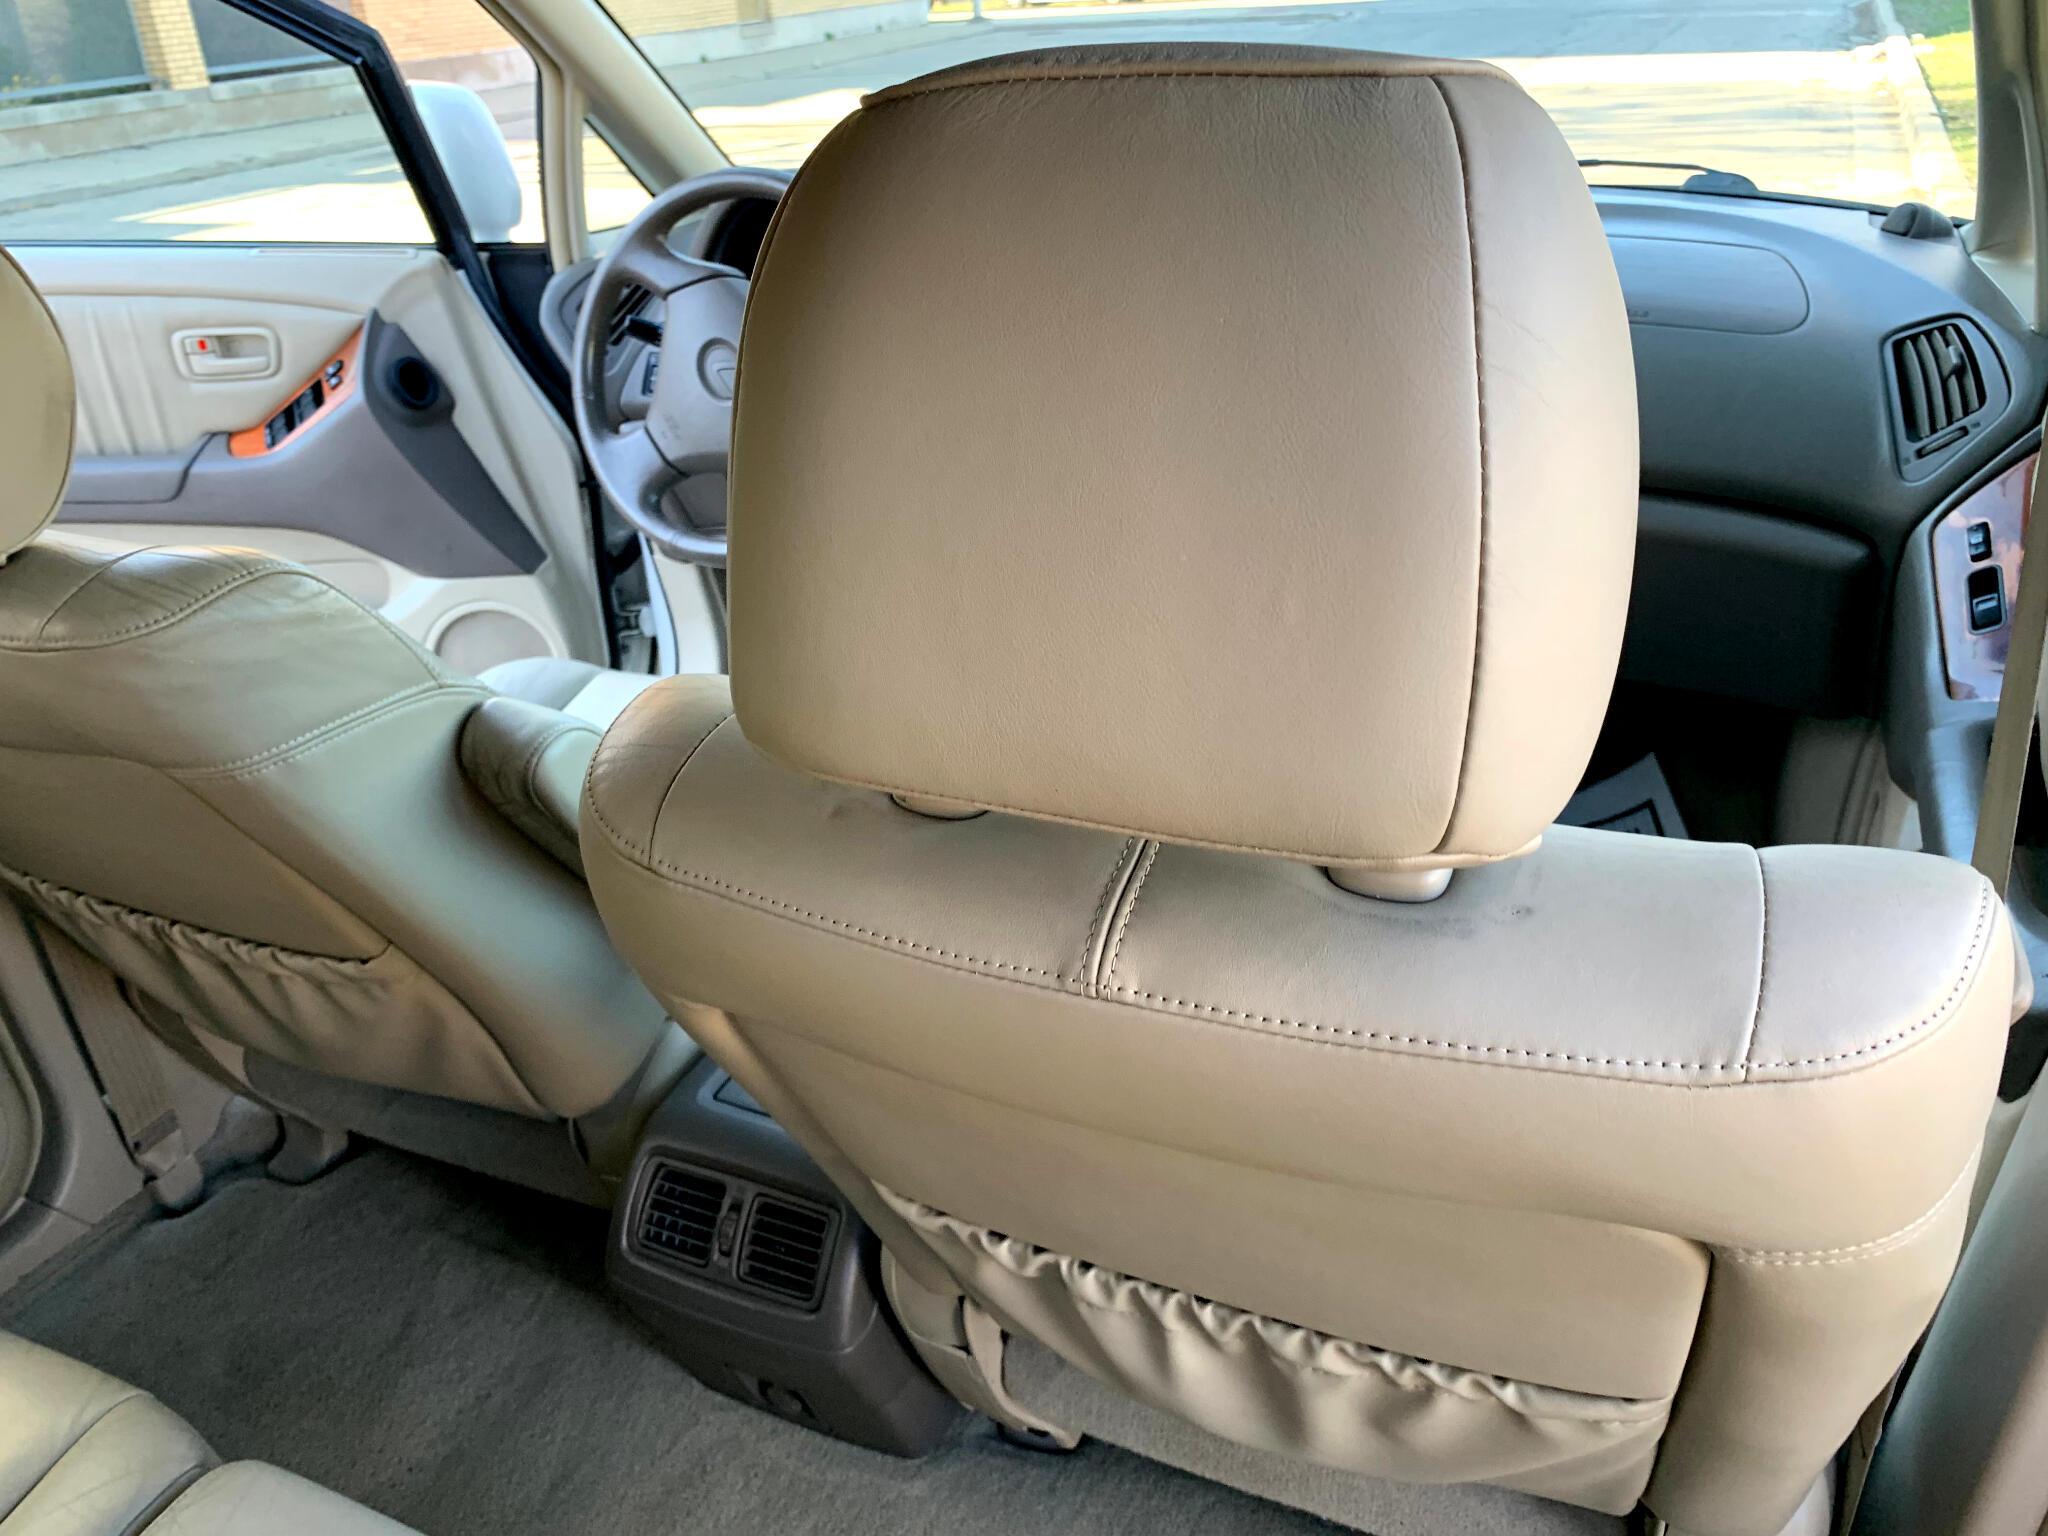 2000 Lexus RX 300 4dr SUV 4WD